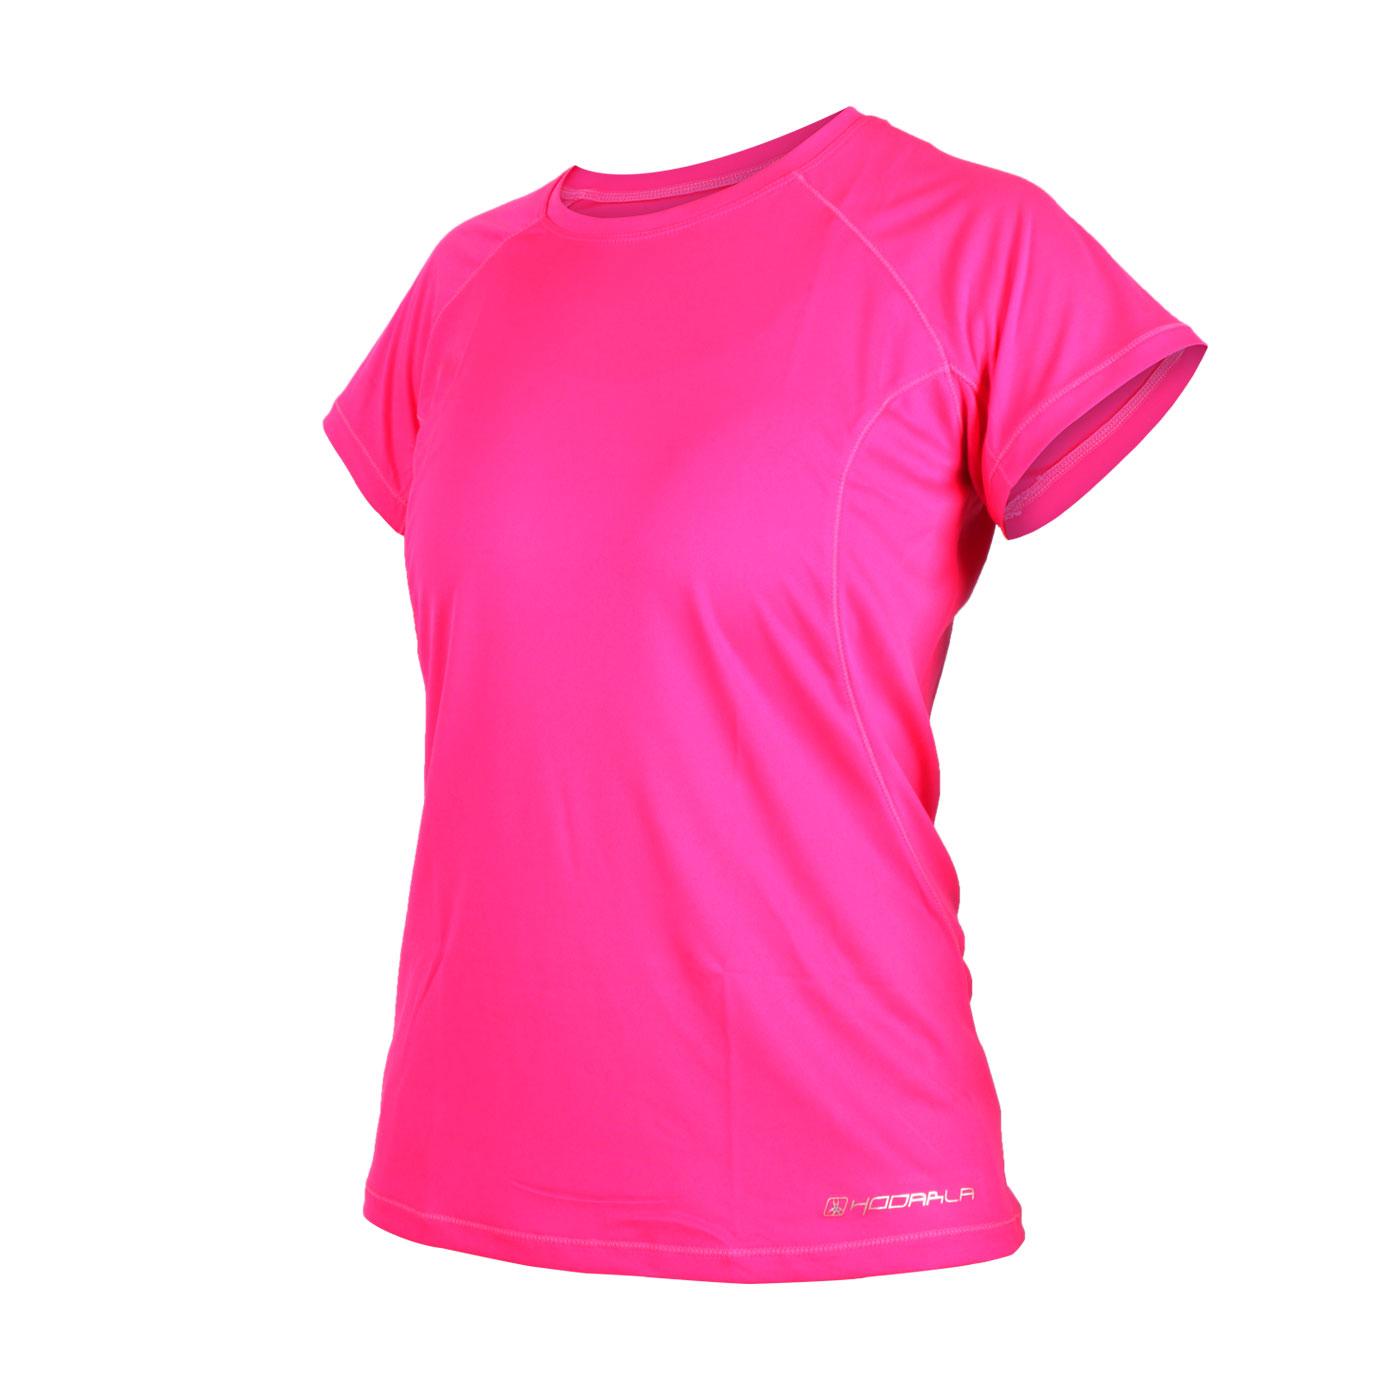 HODARLA 女款星悅無感短袖T恤 3135102 - 透明粉紅